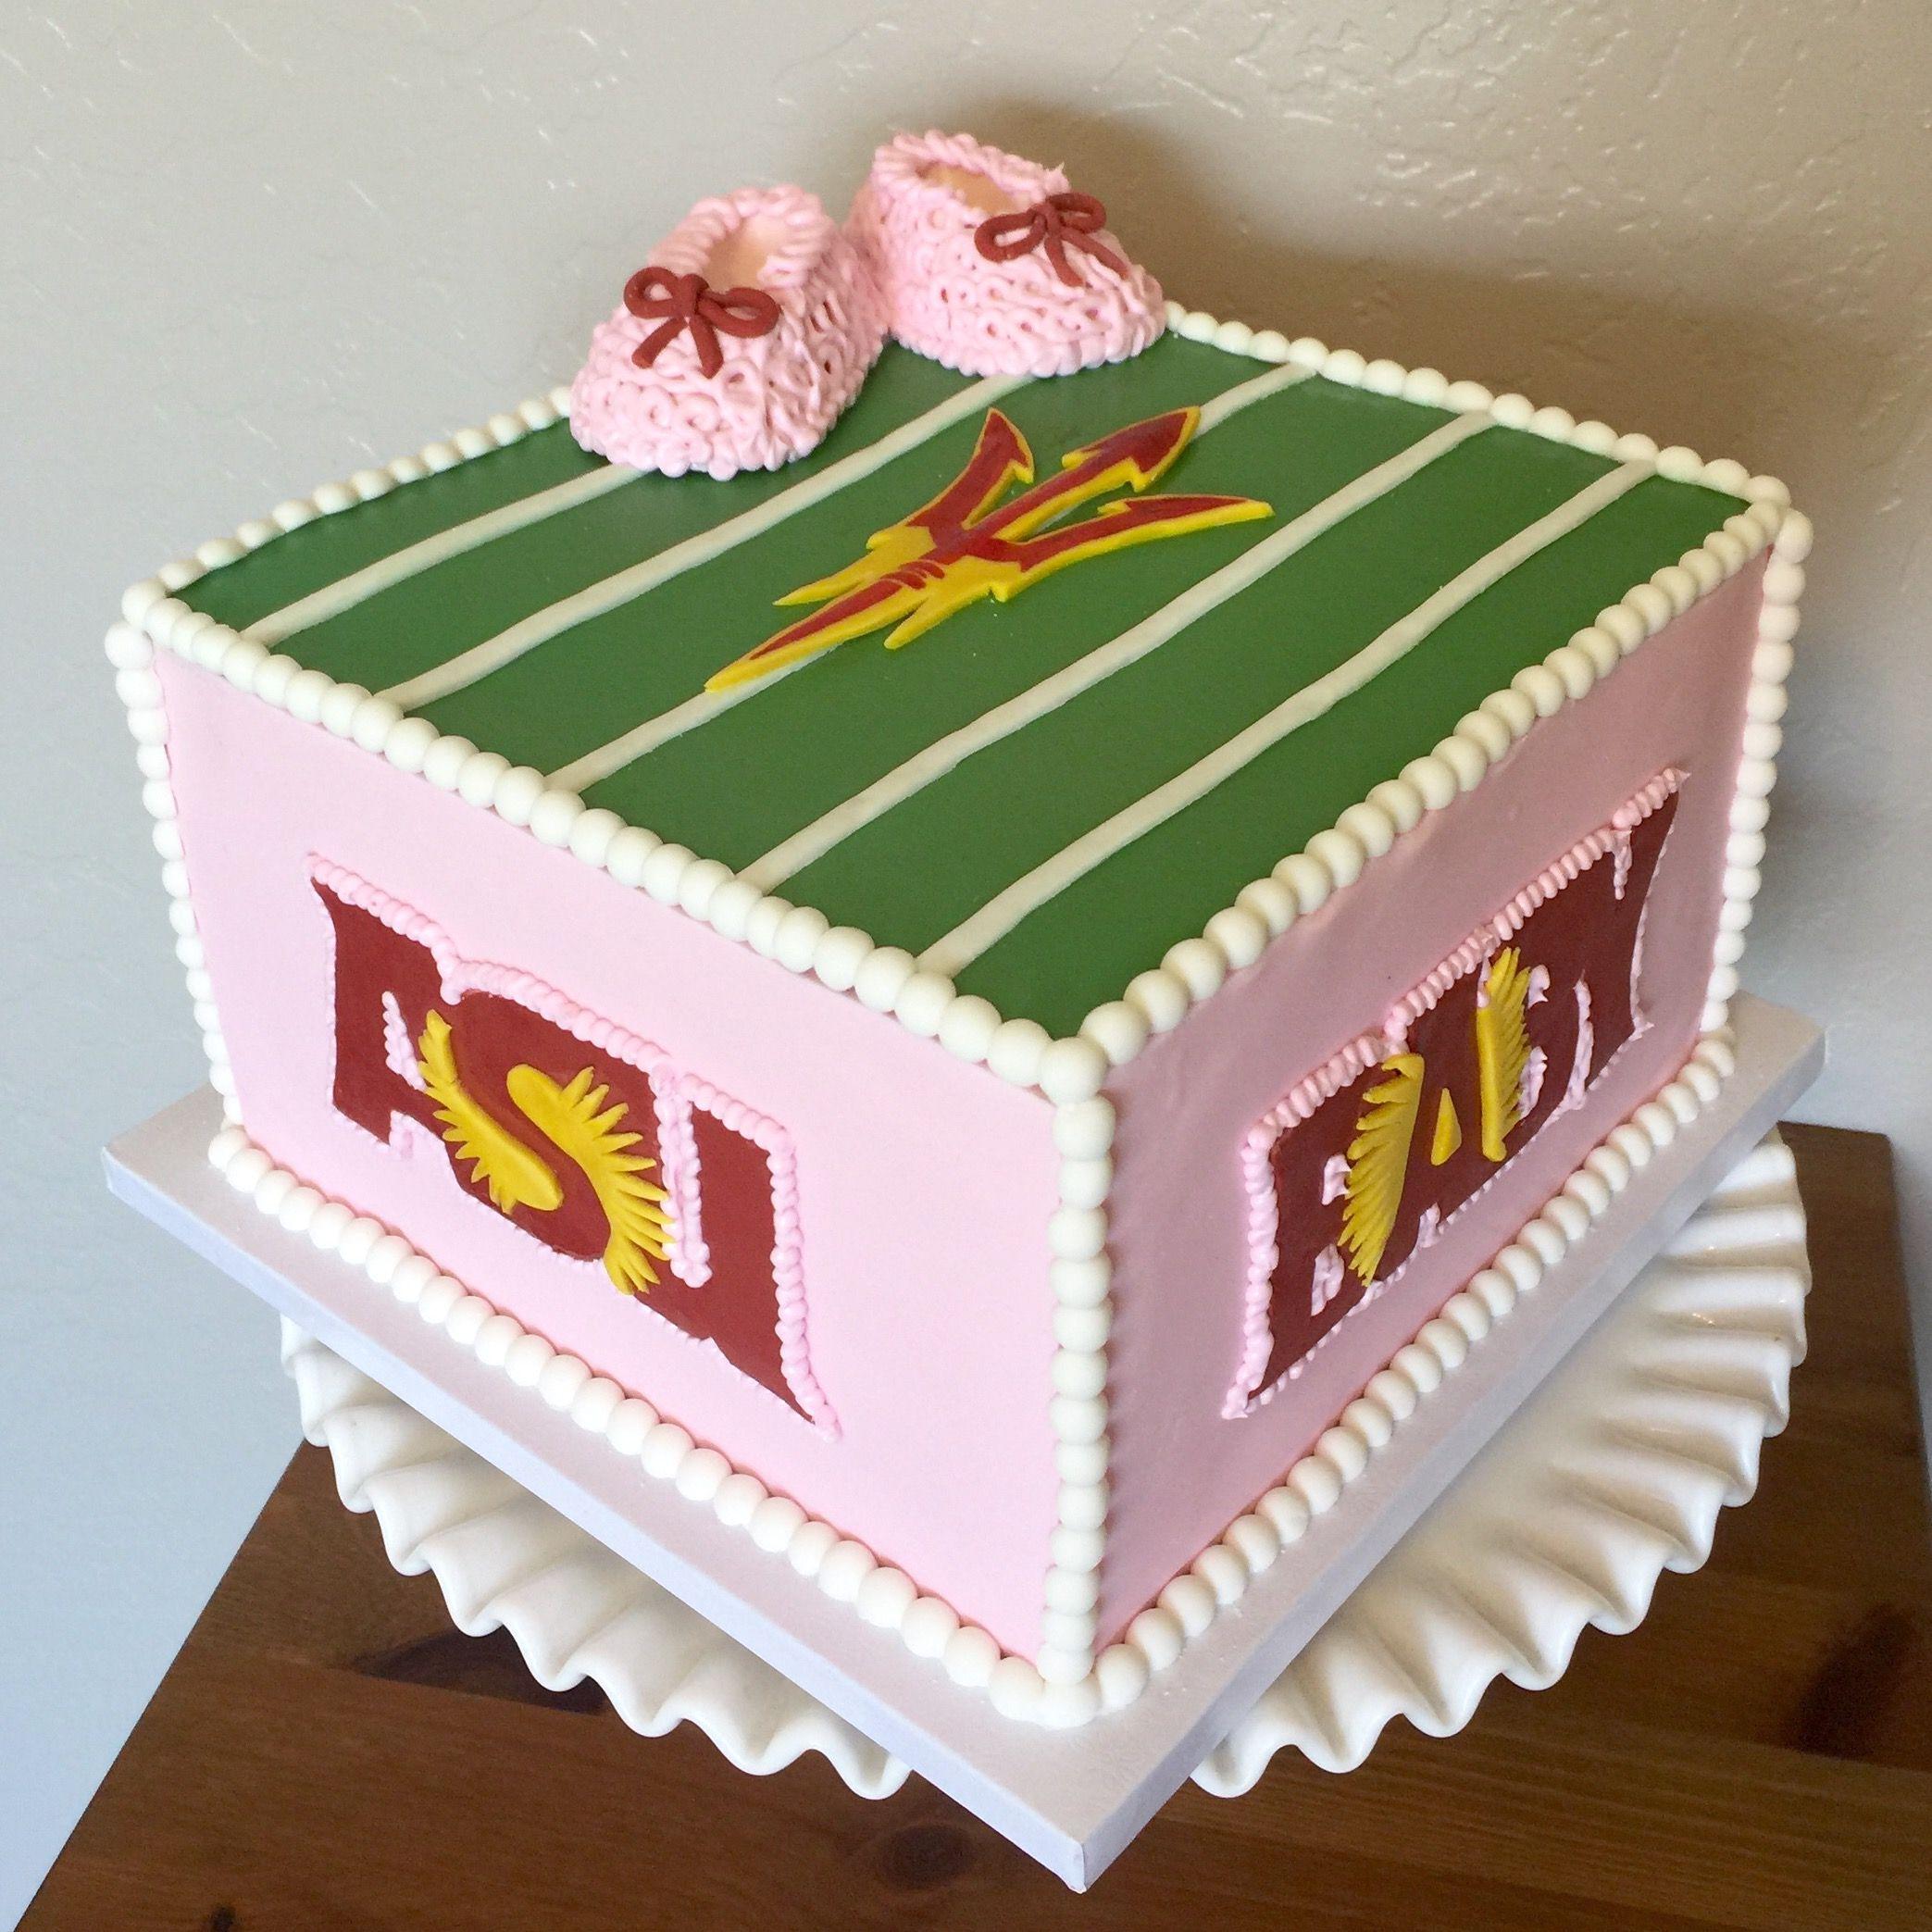 Asu baby shower cake baby shower cakes shower cakes cake